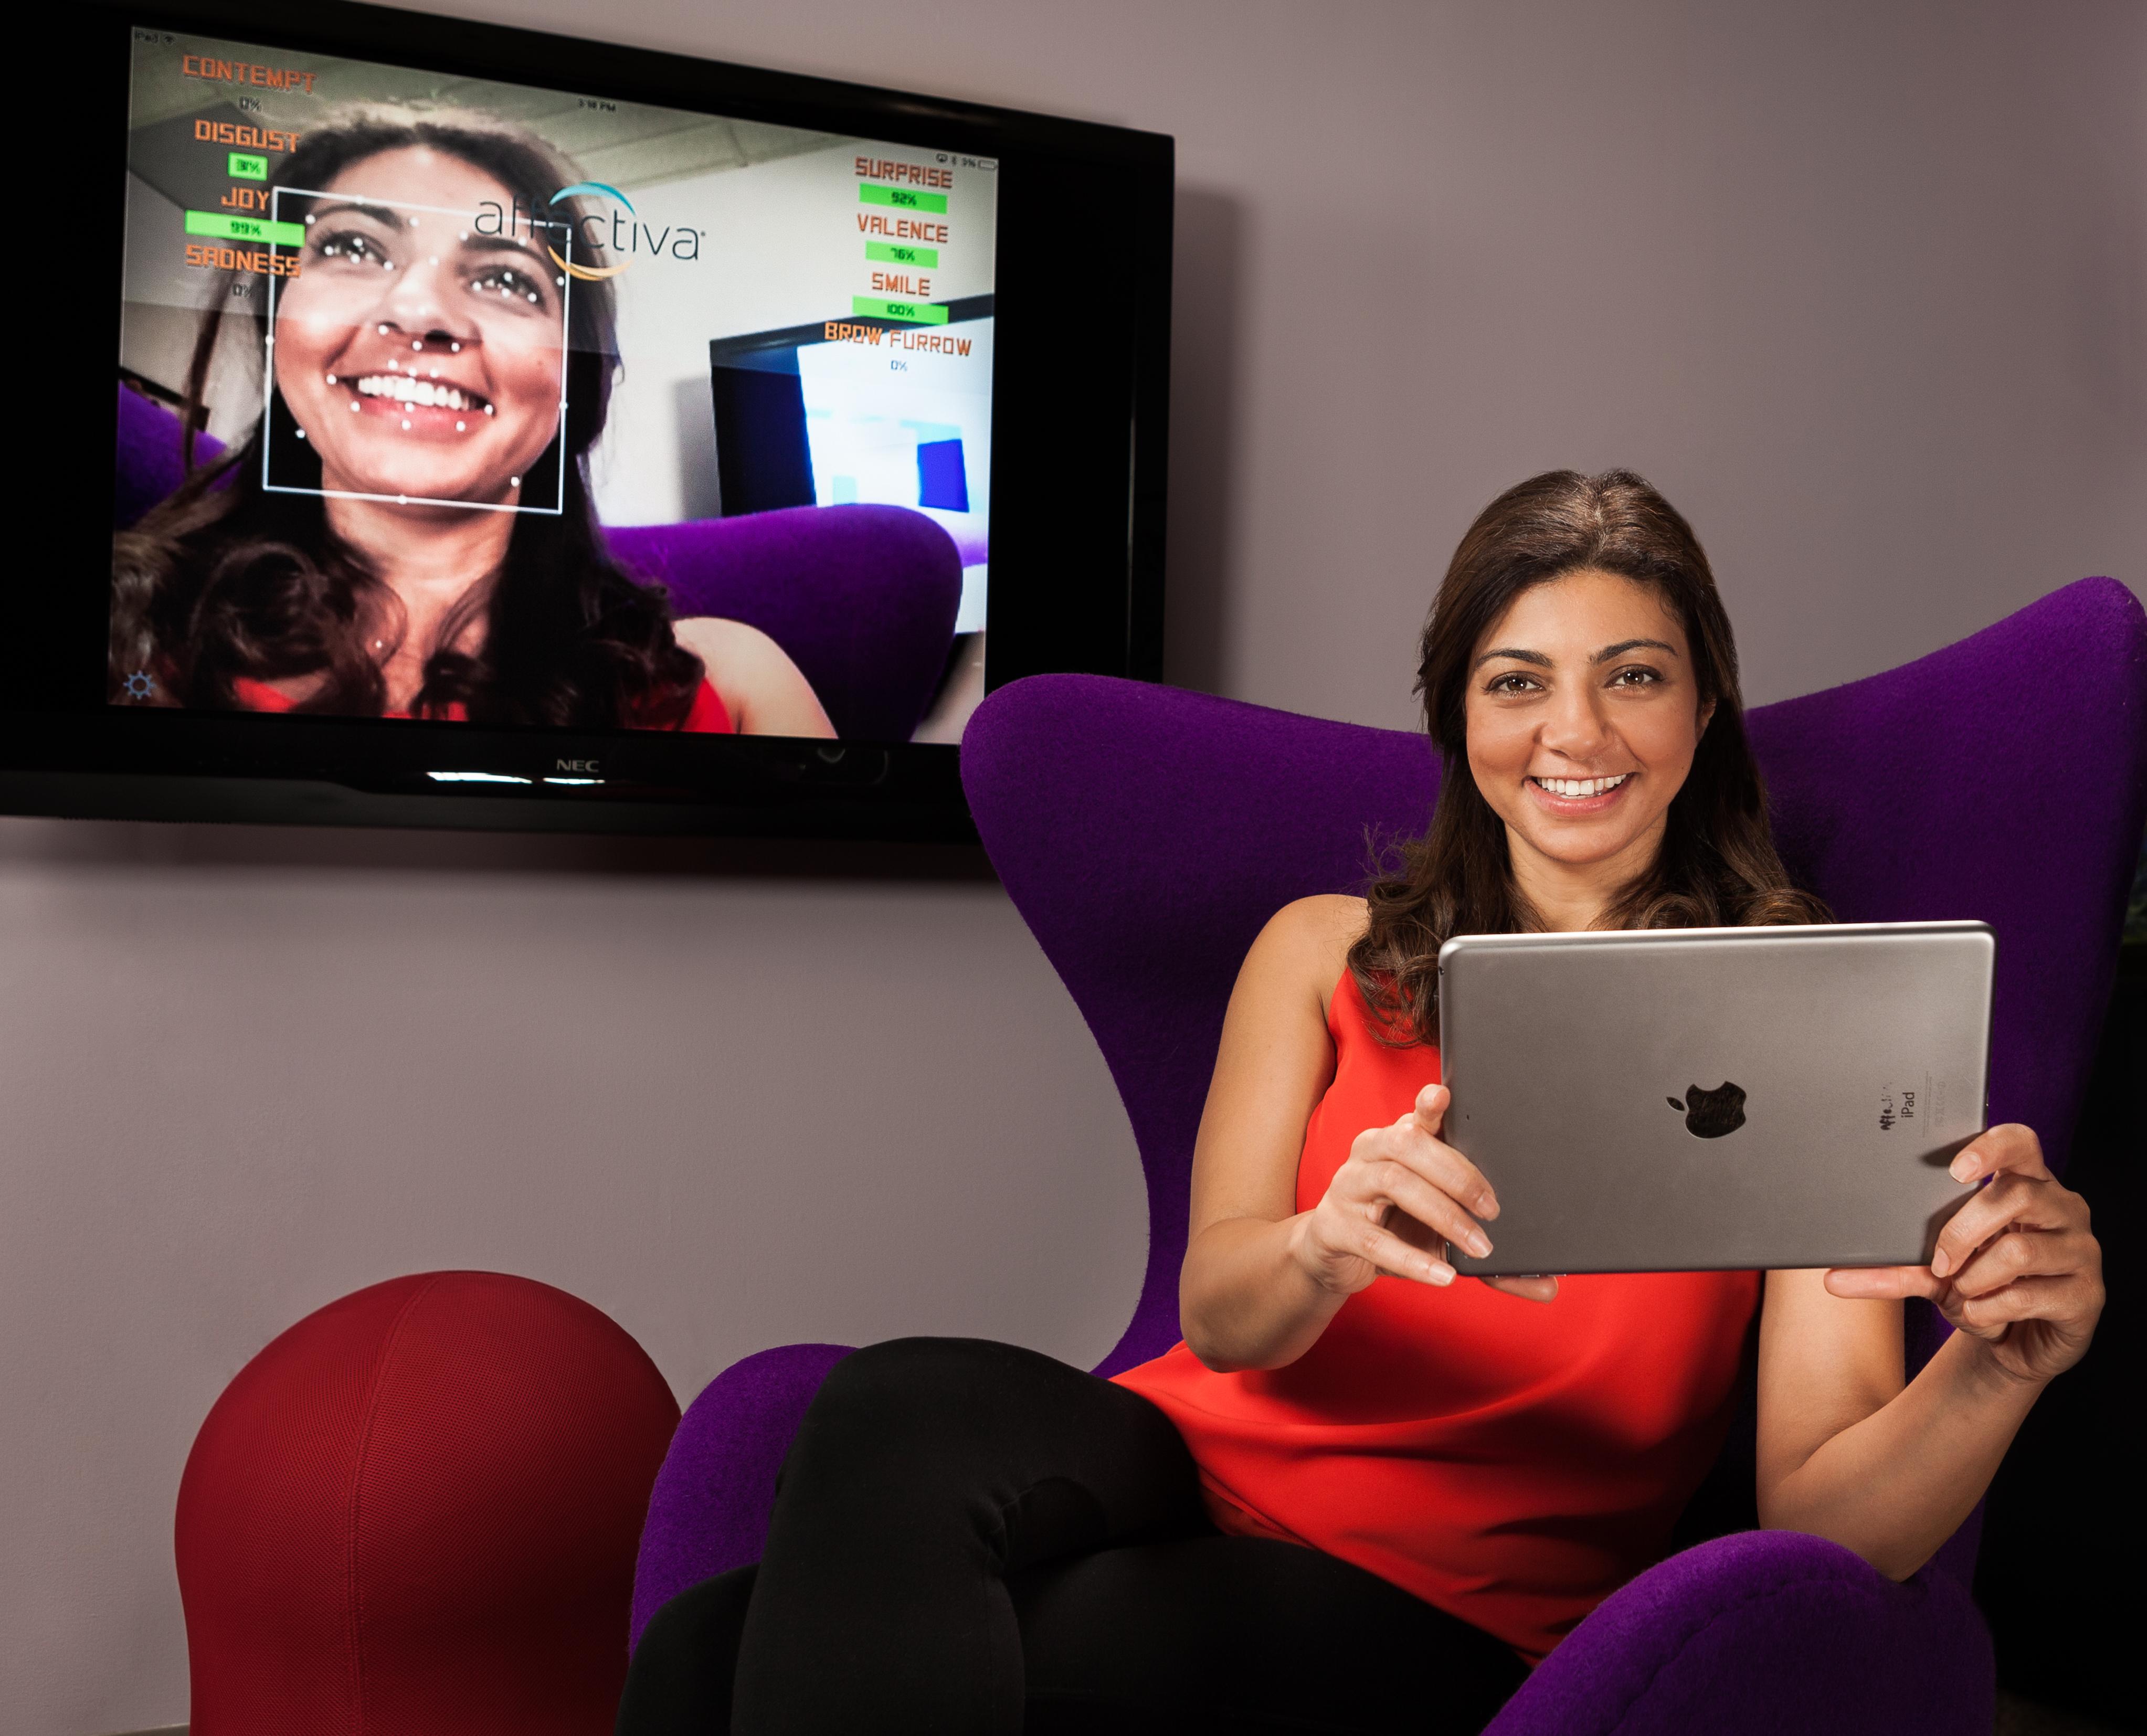 Affectiva raises $14 million to bring apps, robots emotional